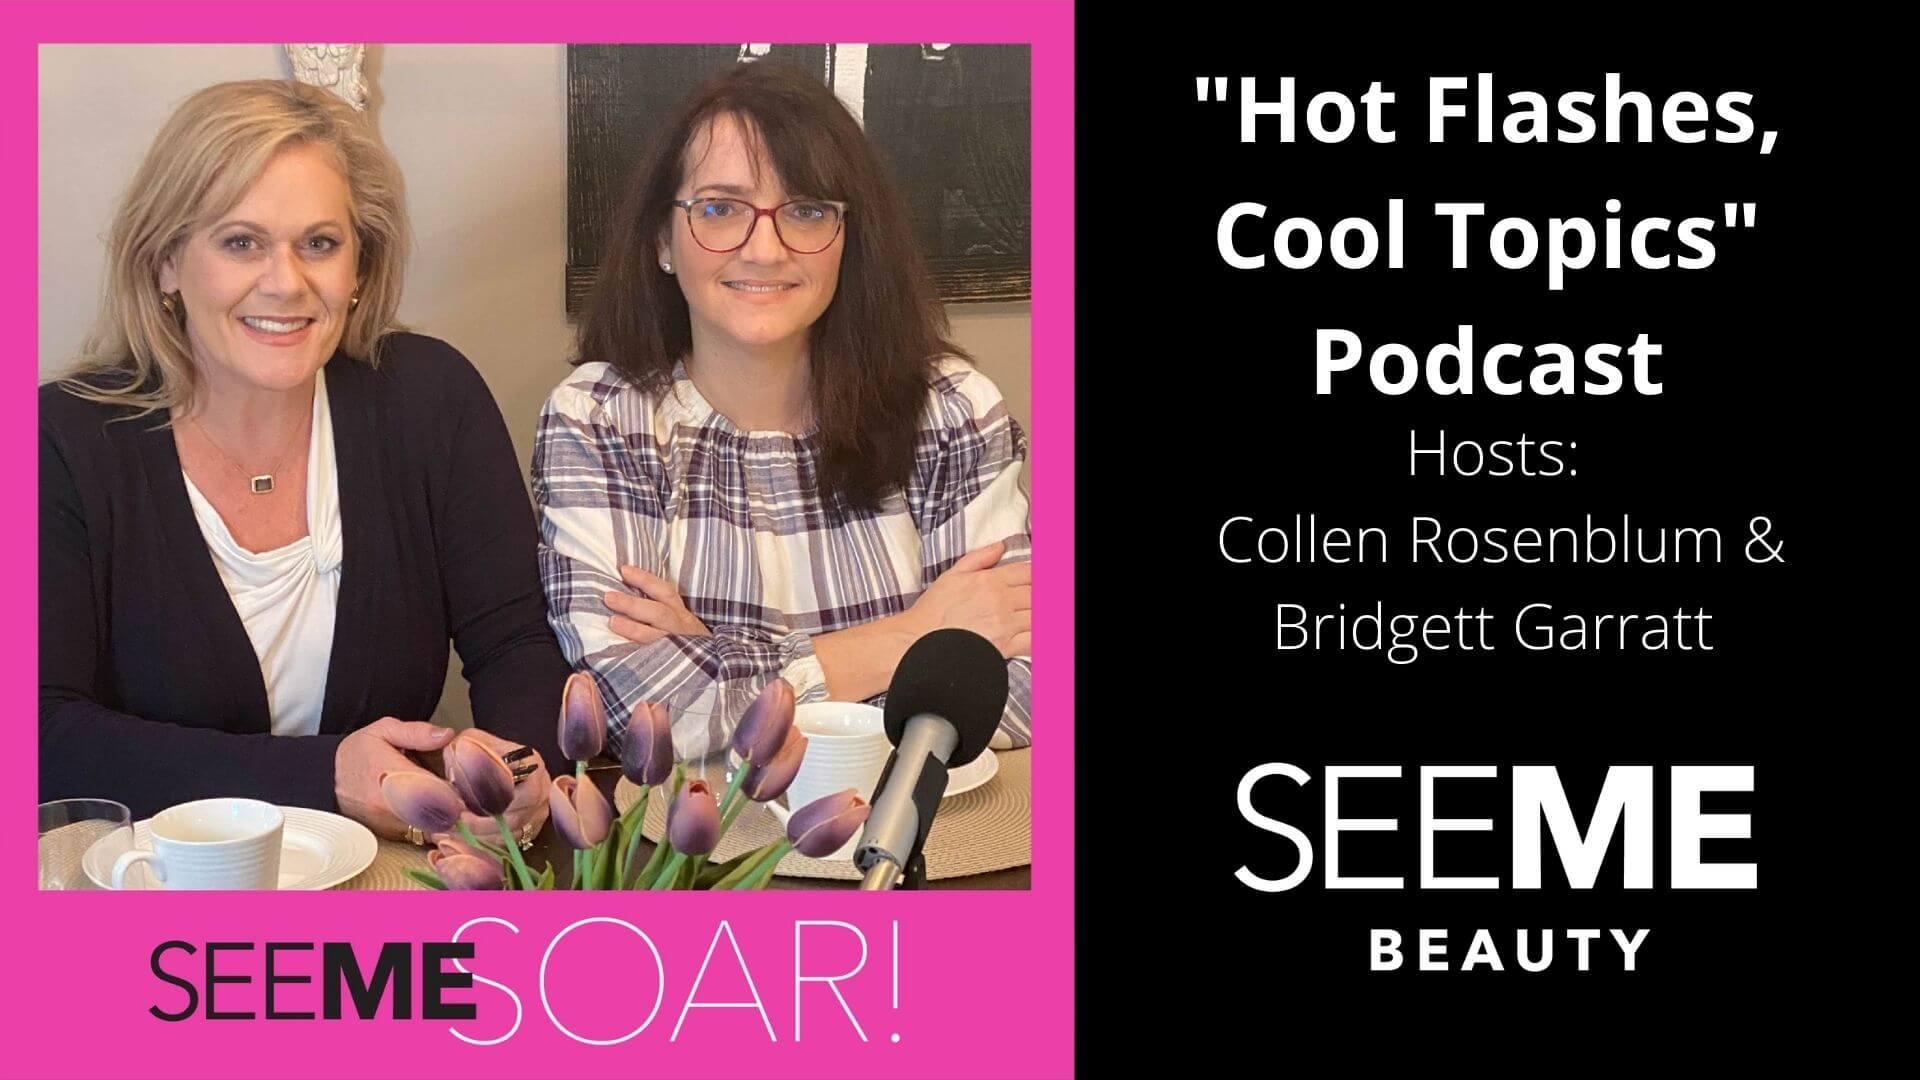 An interview with Hot Flashes, Cool Topics podcast hosts Colleen Rosenbaum and Bridgett Garratt. Celebrating women over 50 with SeeMe SOAR